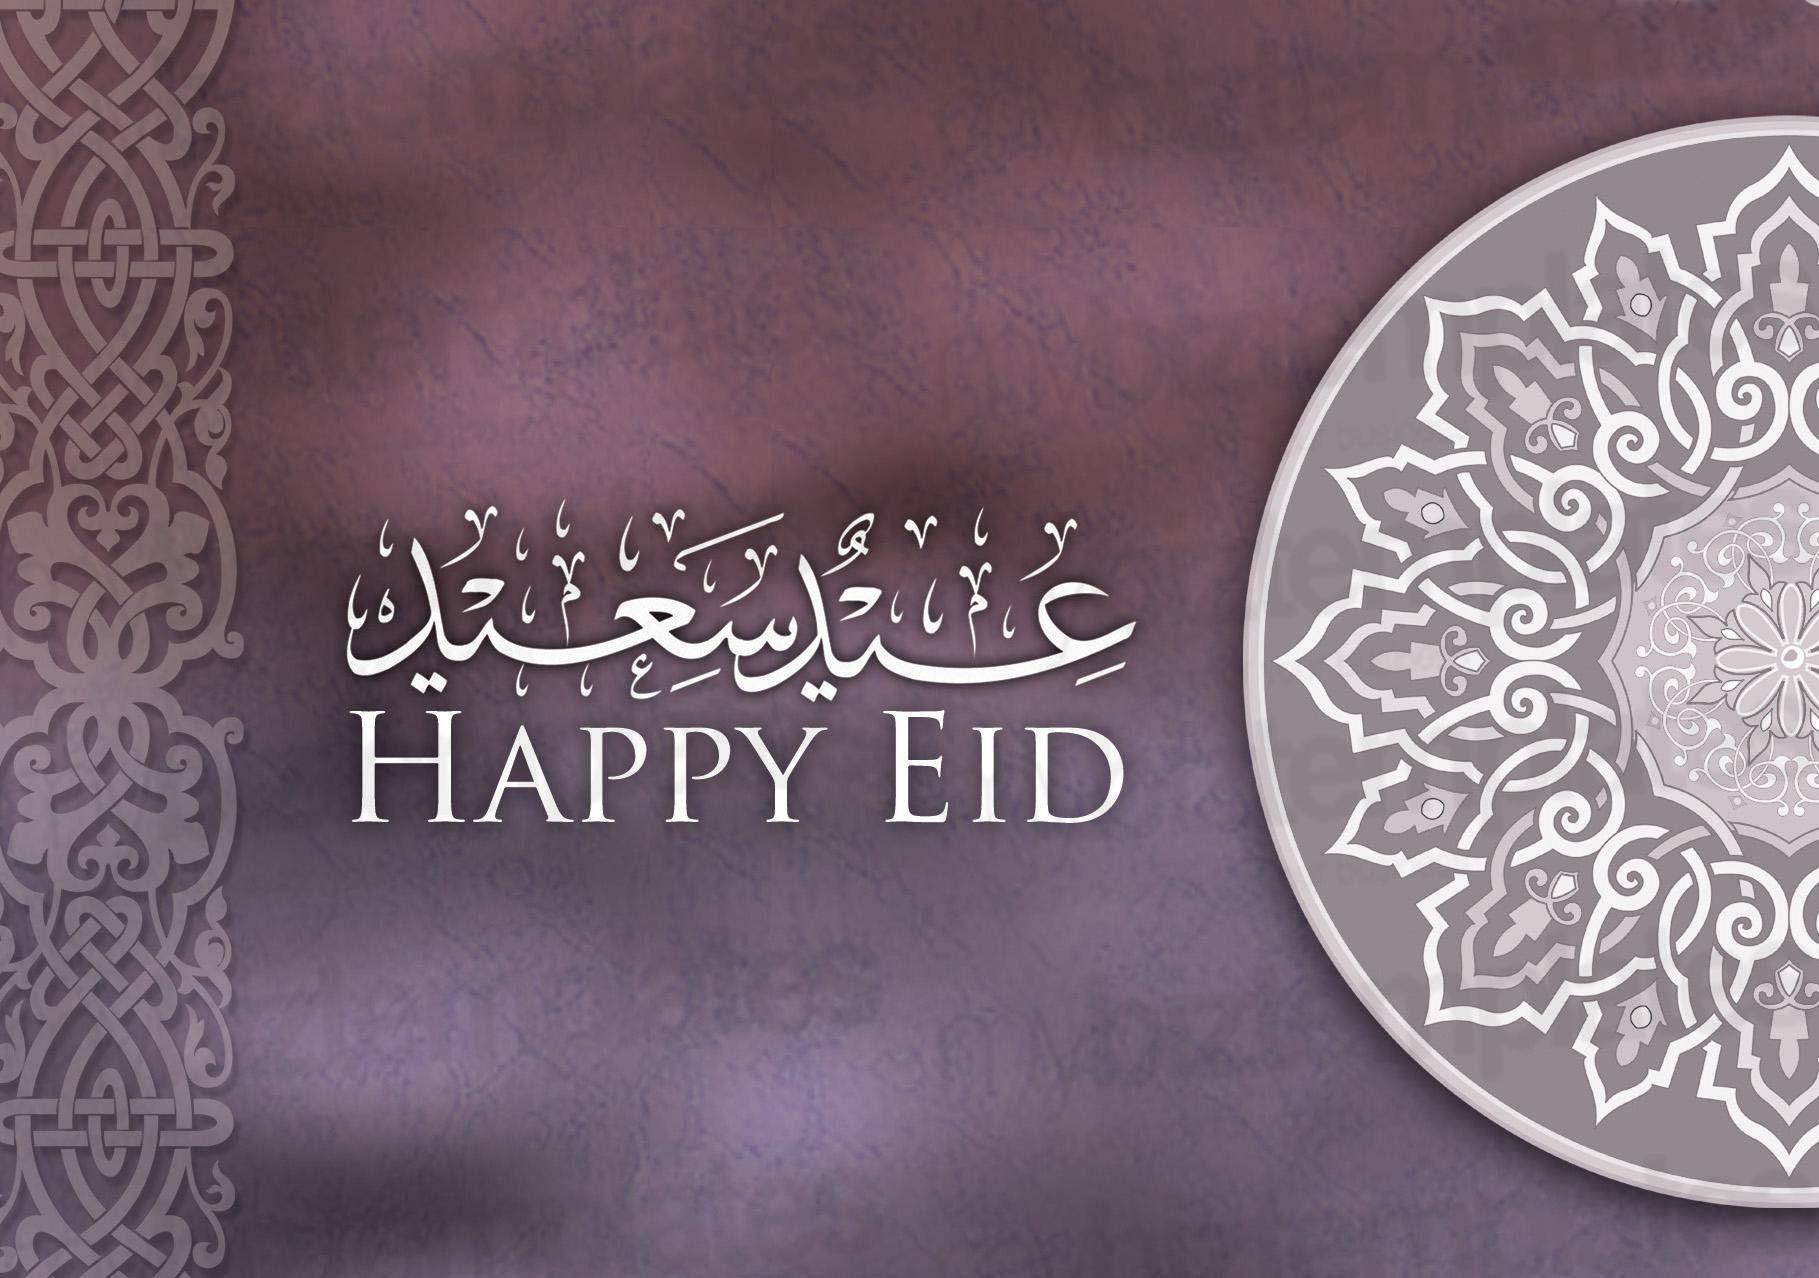 Happy EID Al-Fitr Mubarak: تقبل الله منا ومنكم صالح الأعمال